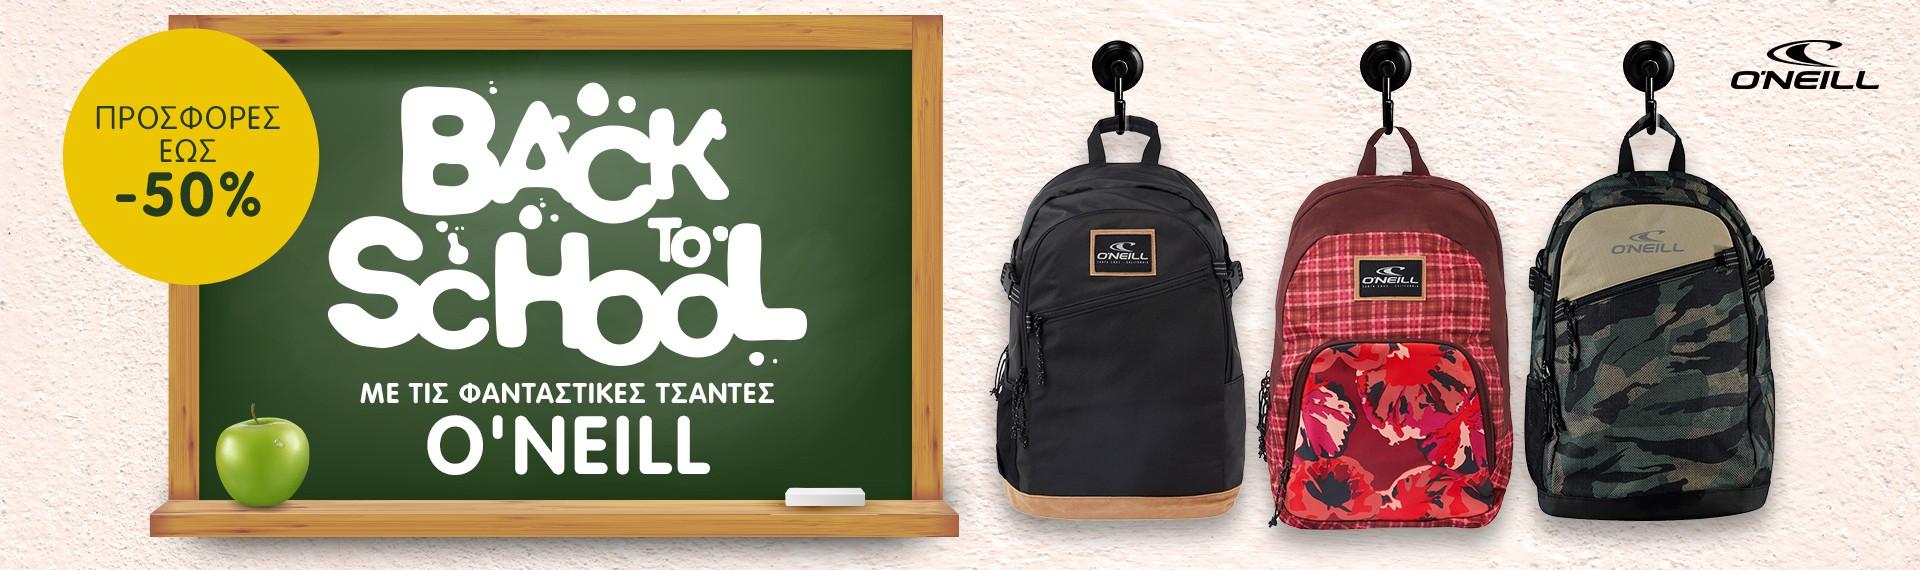 O'neill Back to School